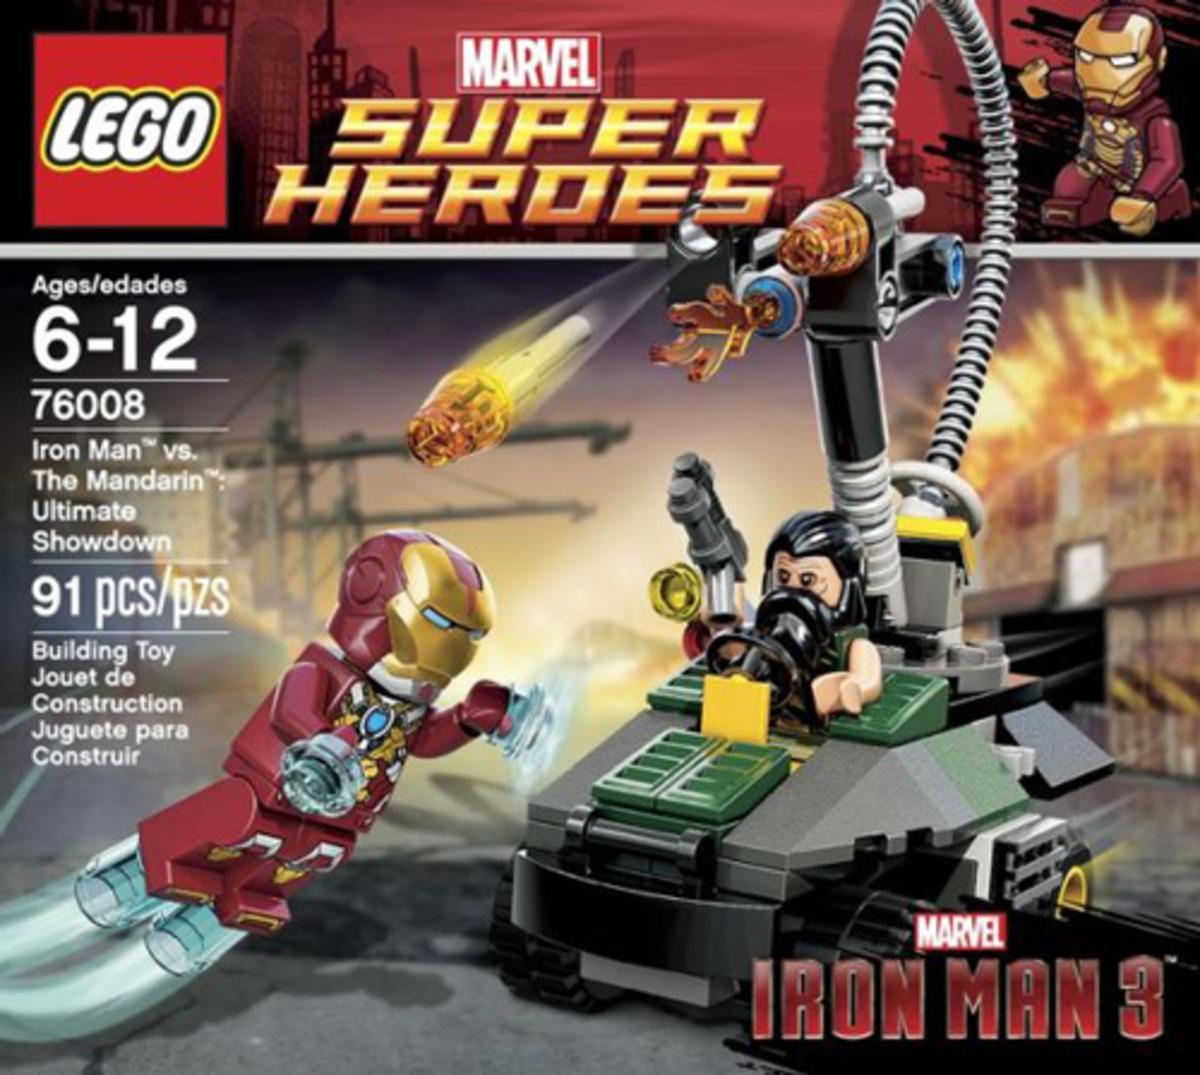 LEGO Super Heroes Iron Man vs The Mandarin: Ultimate Showdown 76008 Box